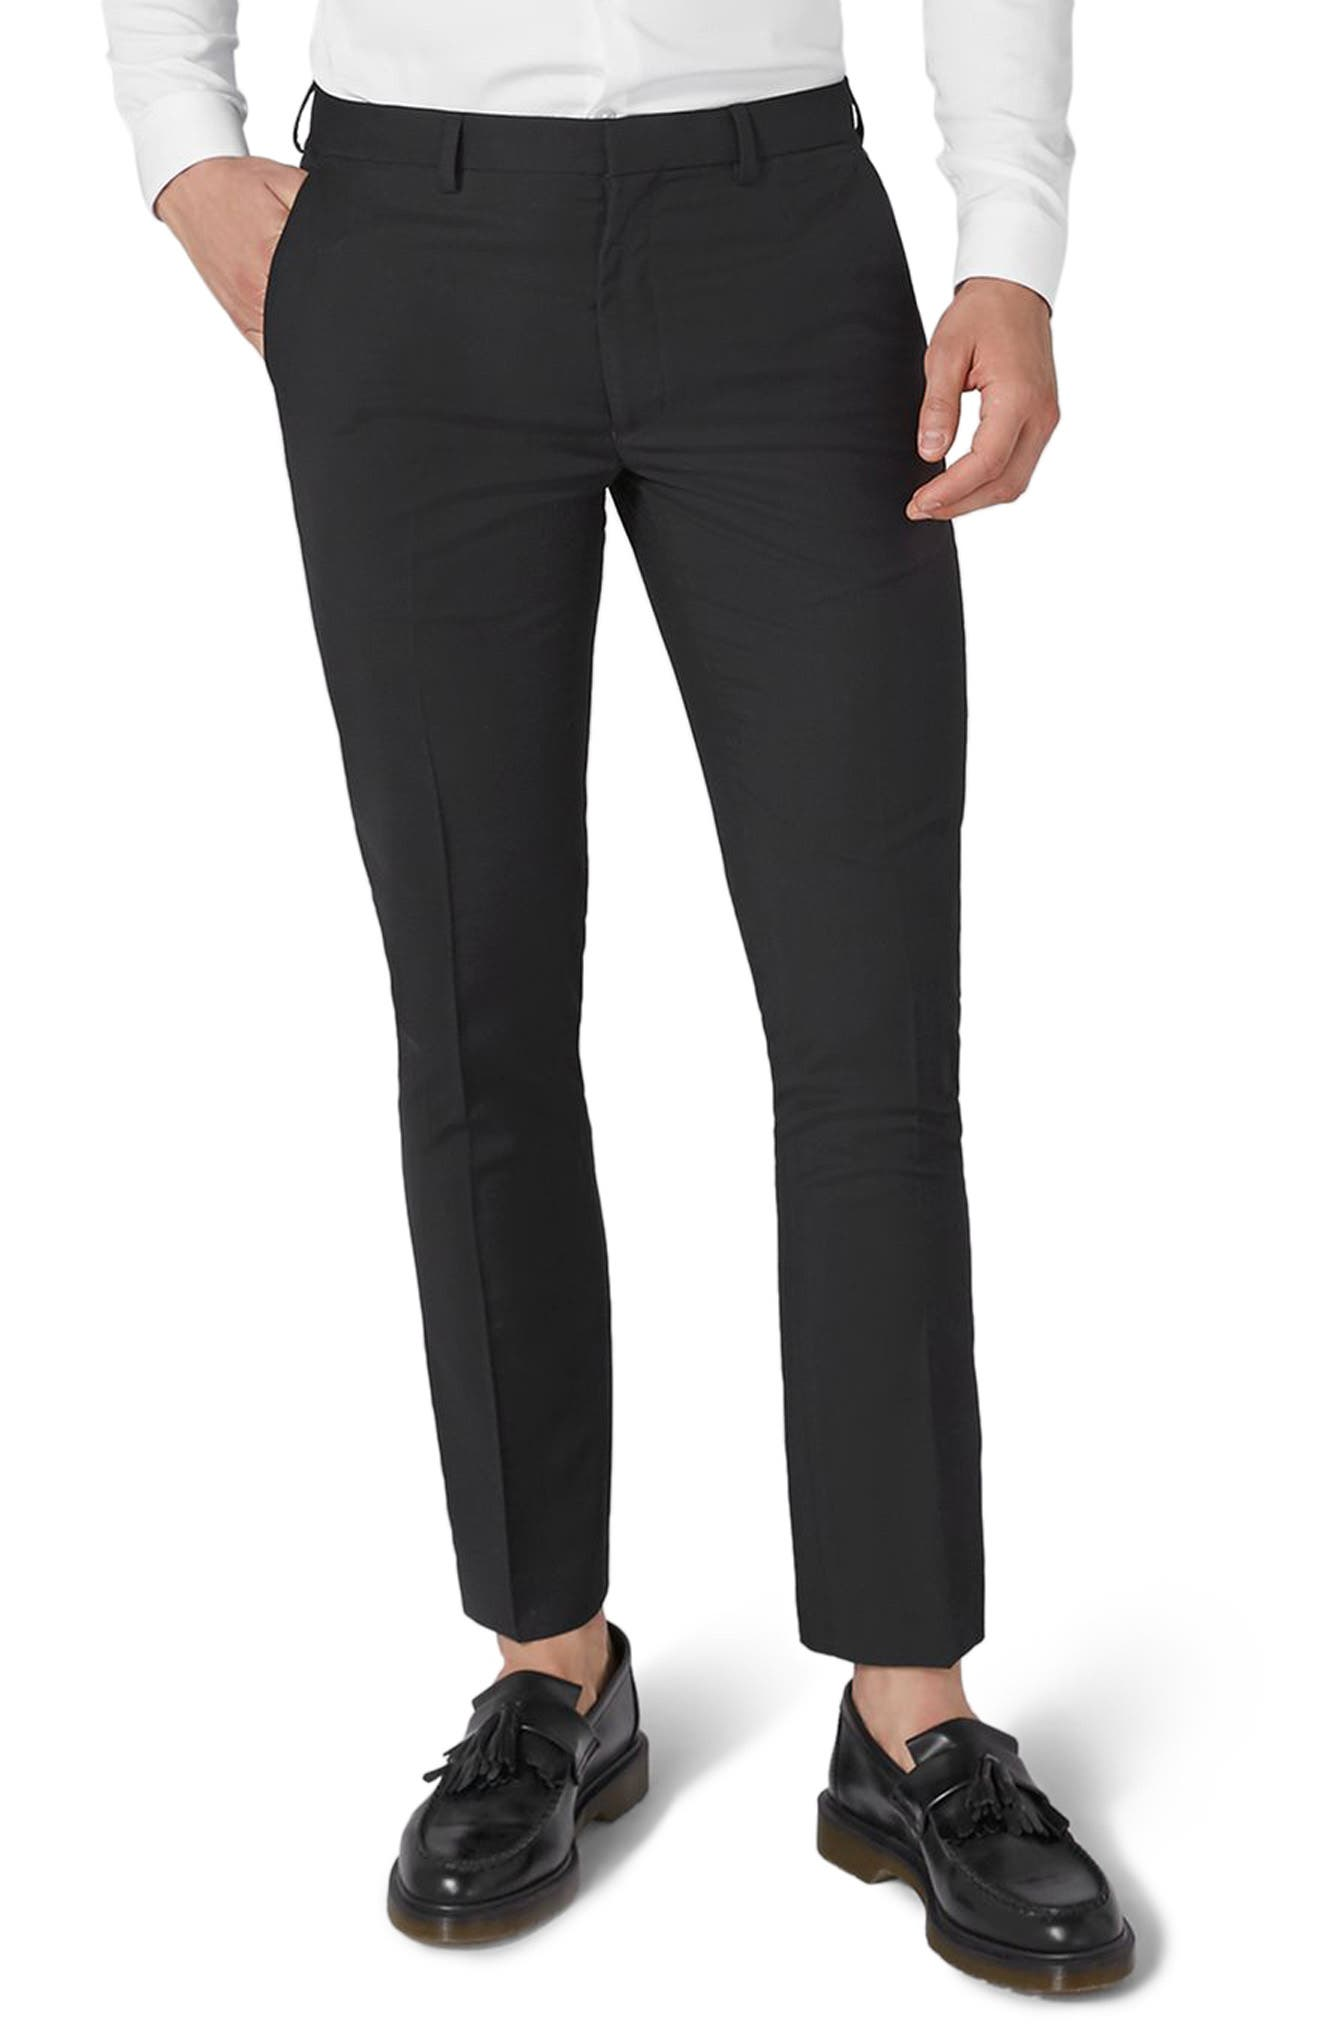 Black Skinny Fit Trousers,                         Main,                         color, Black